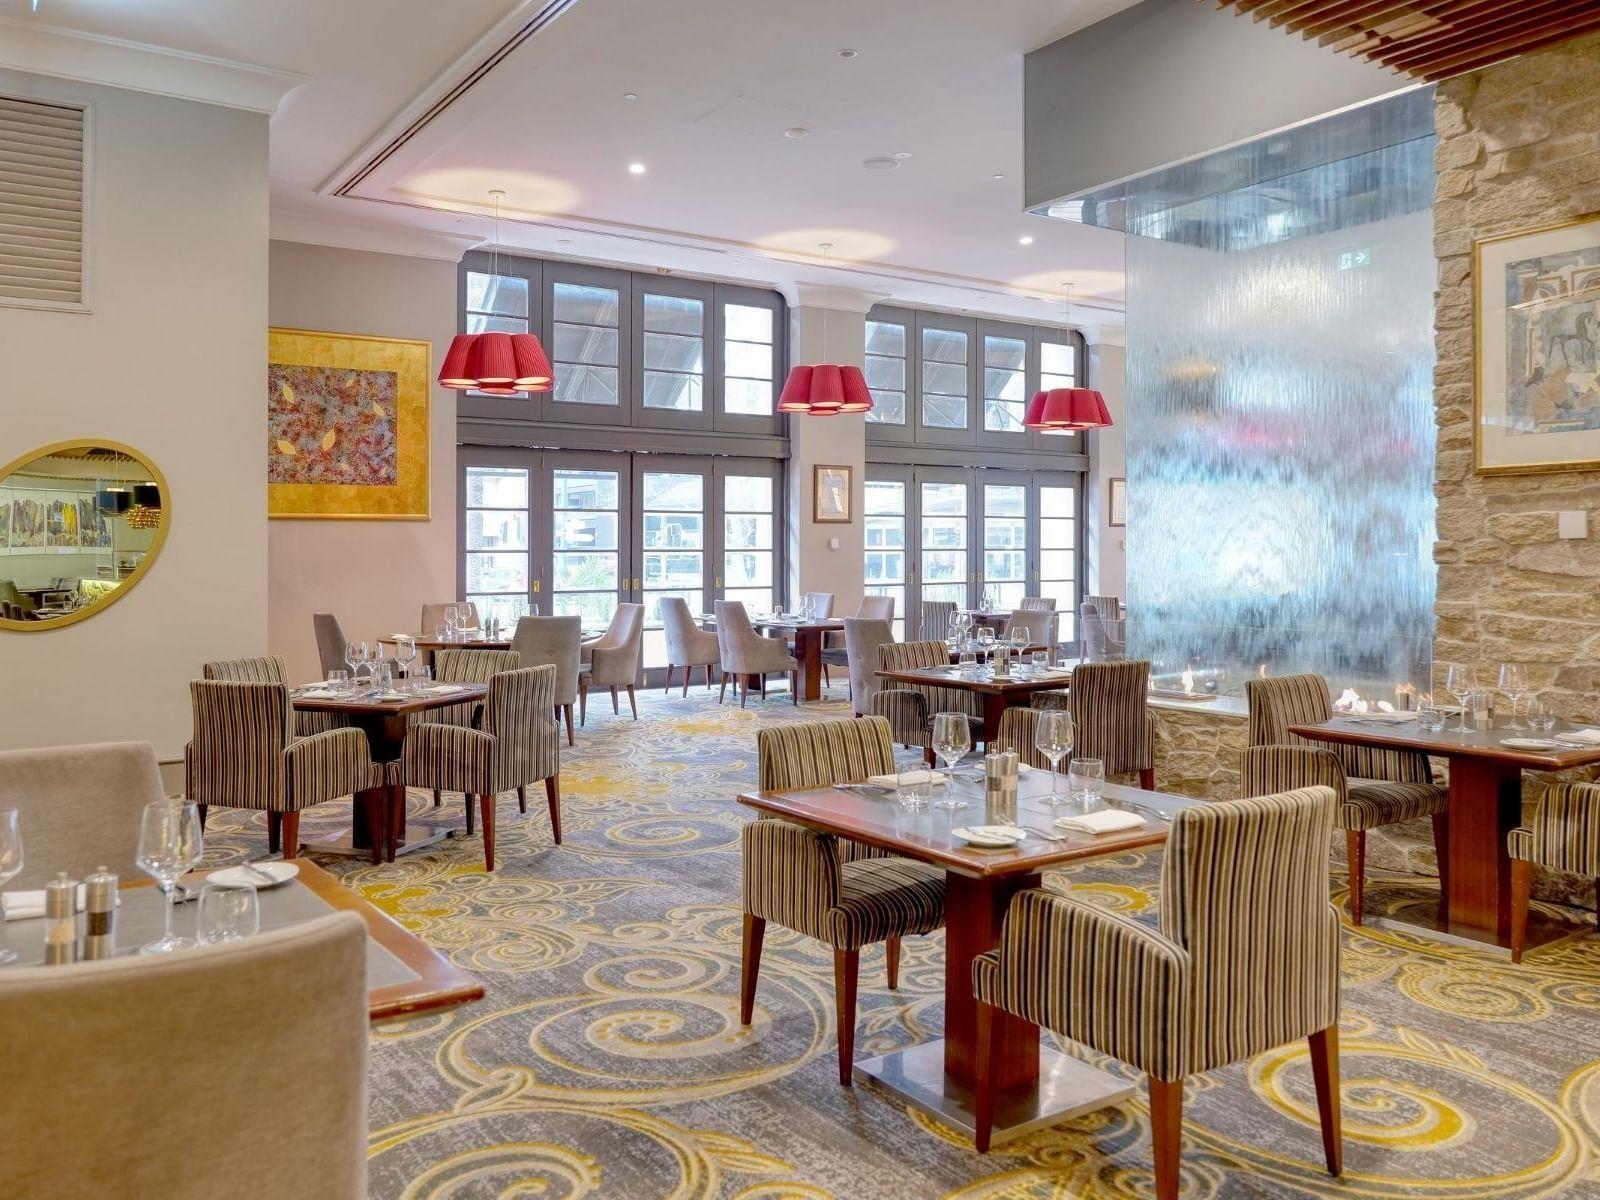 Buffet Breakfast Restaurant  in Duxton Hotel Perth